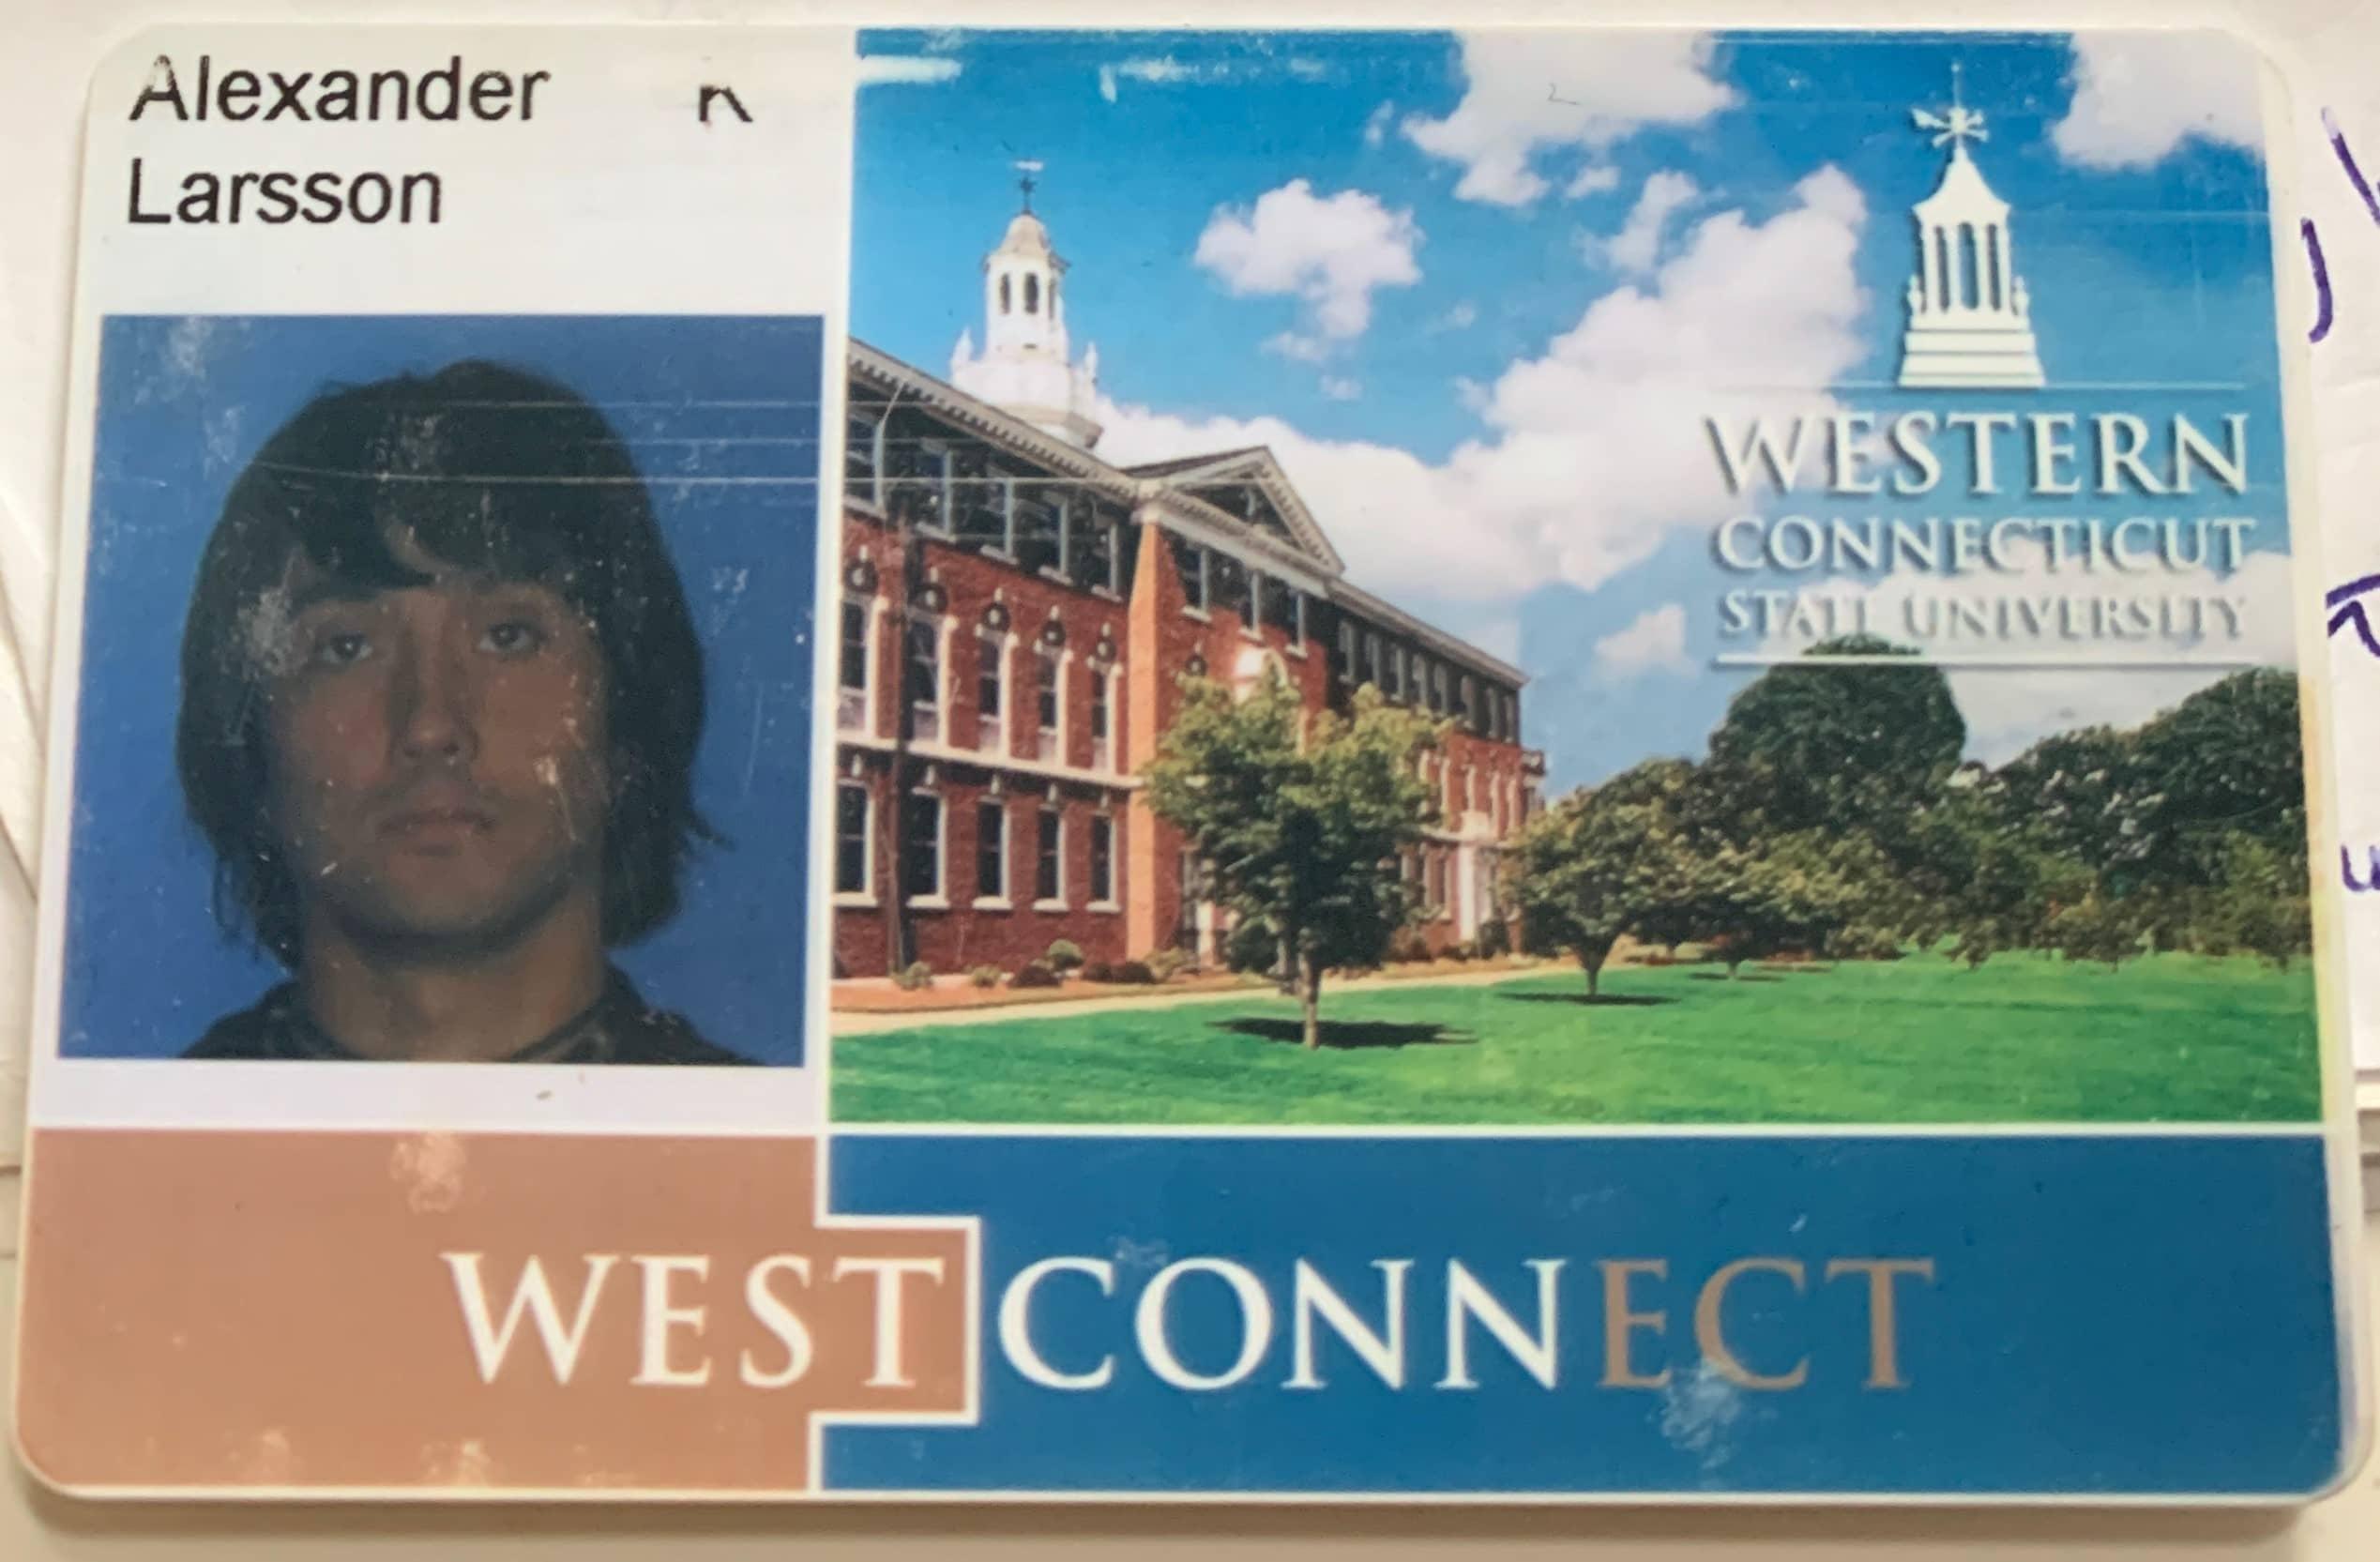 alex larsson's college id photo